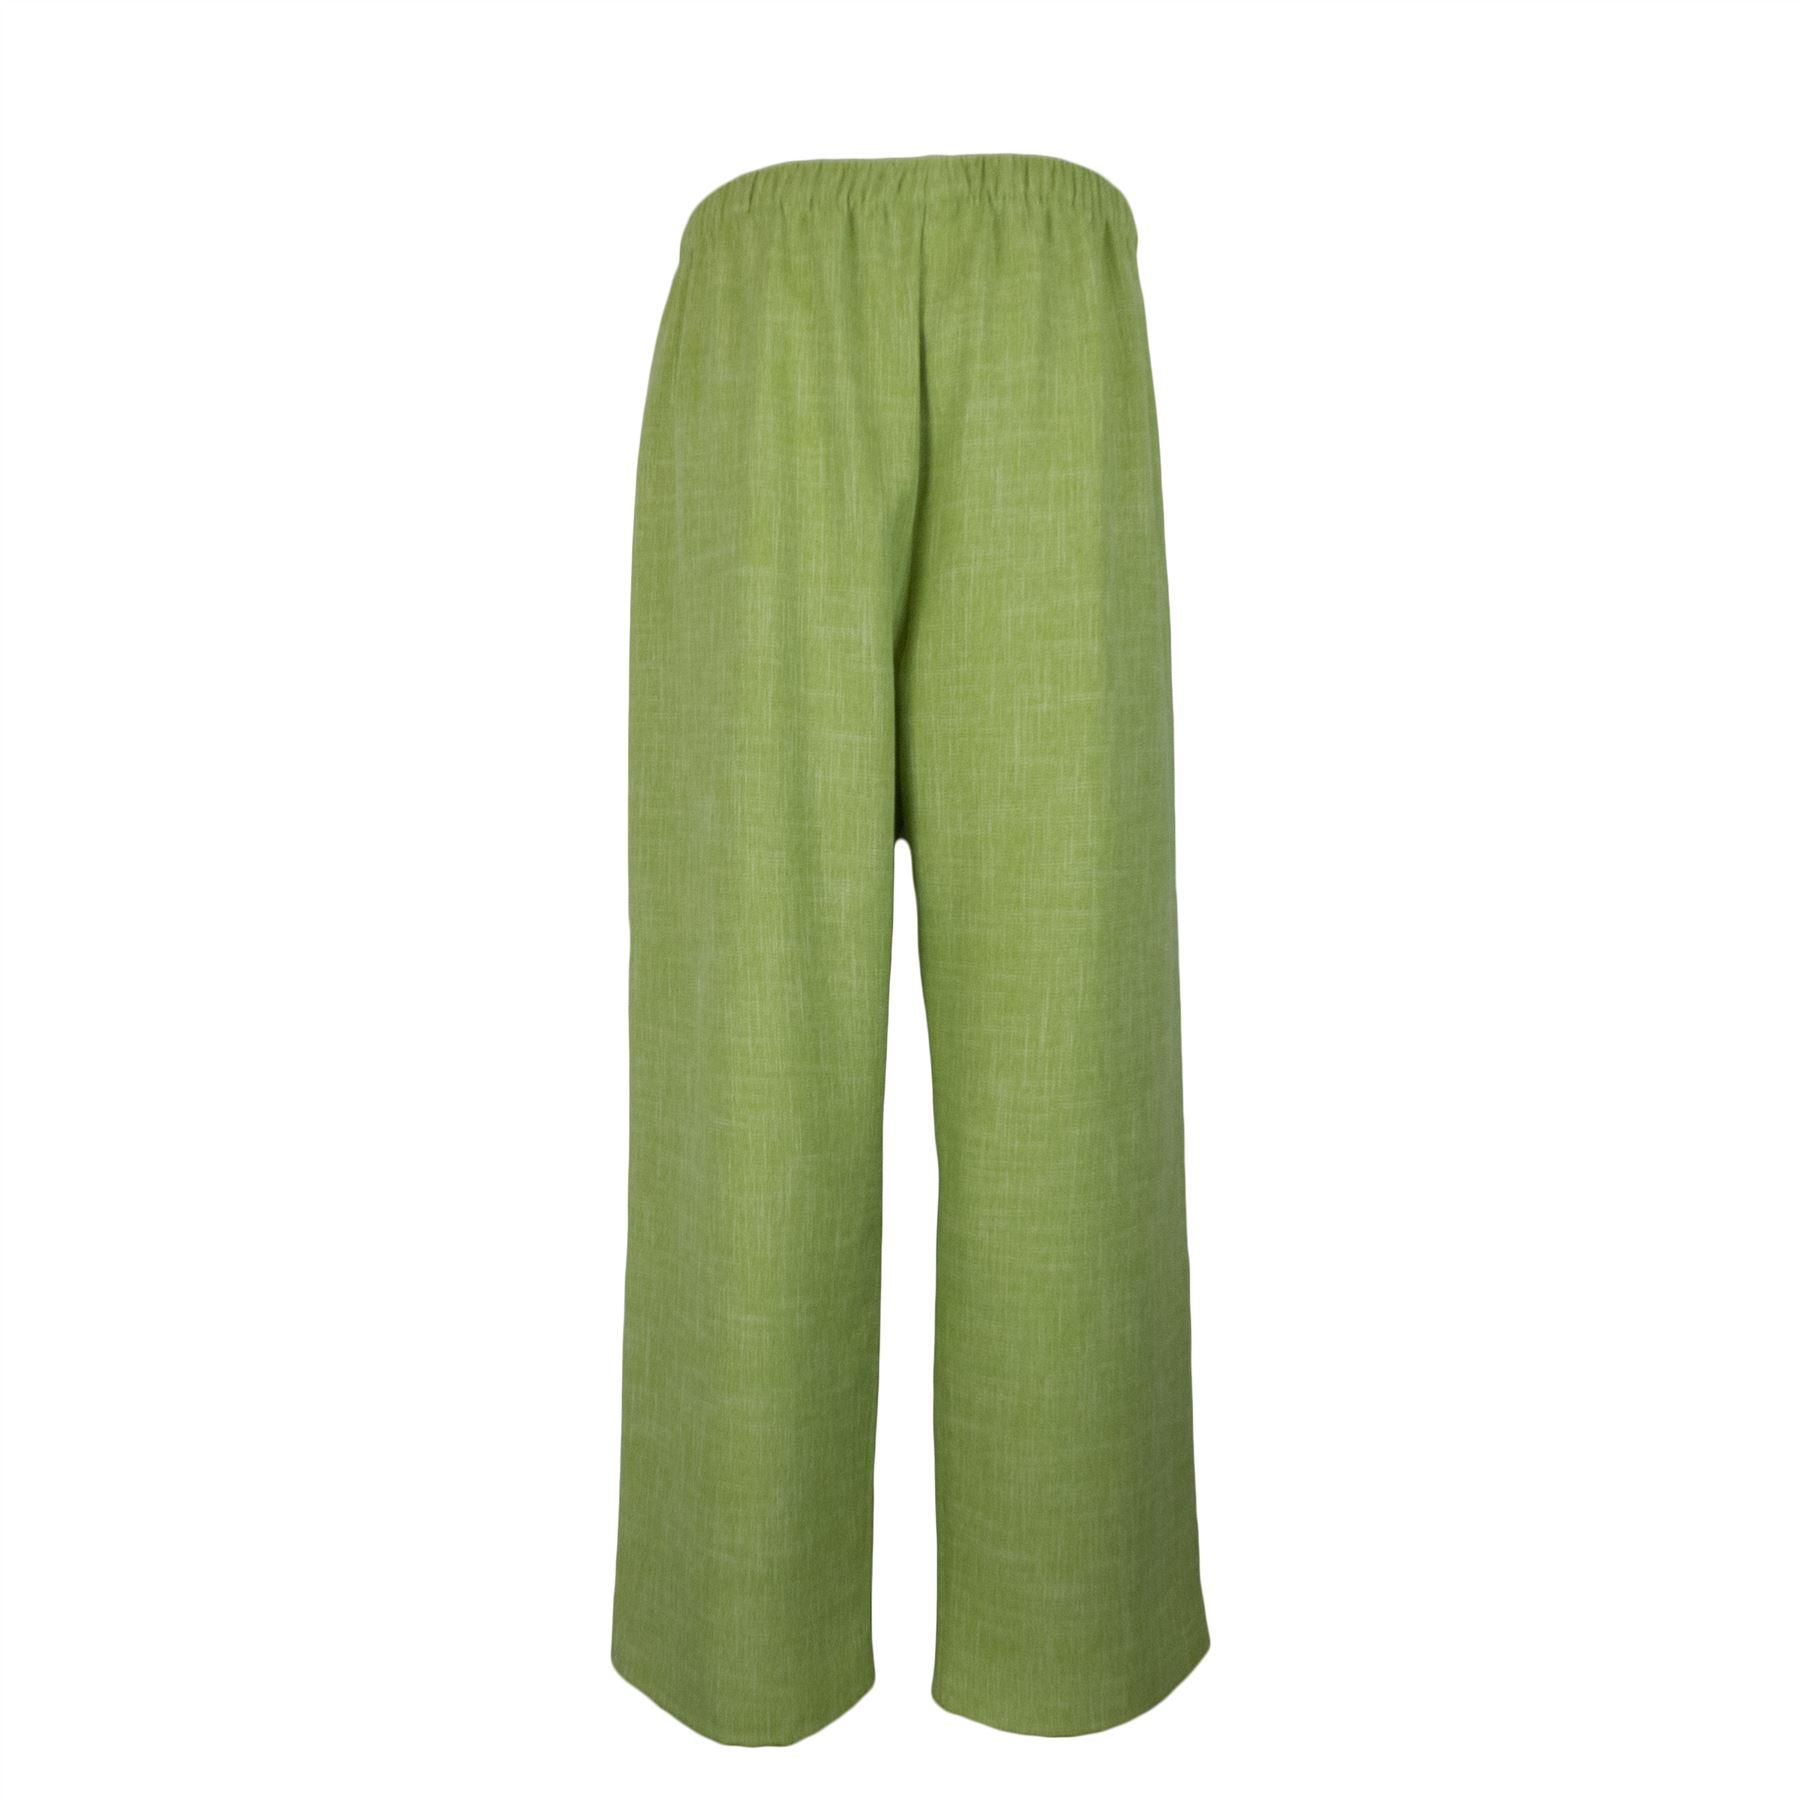 Saloos-Linen-Look-Trouser-Casual-or-Eveningwear-Elasticated-Waist thumbnail 15